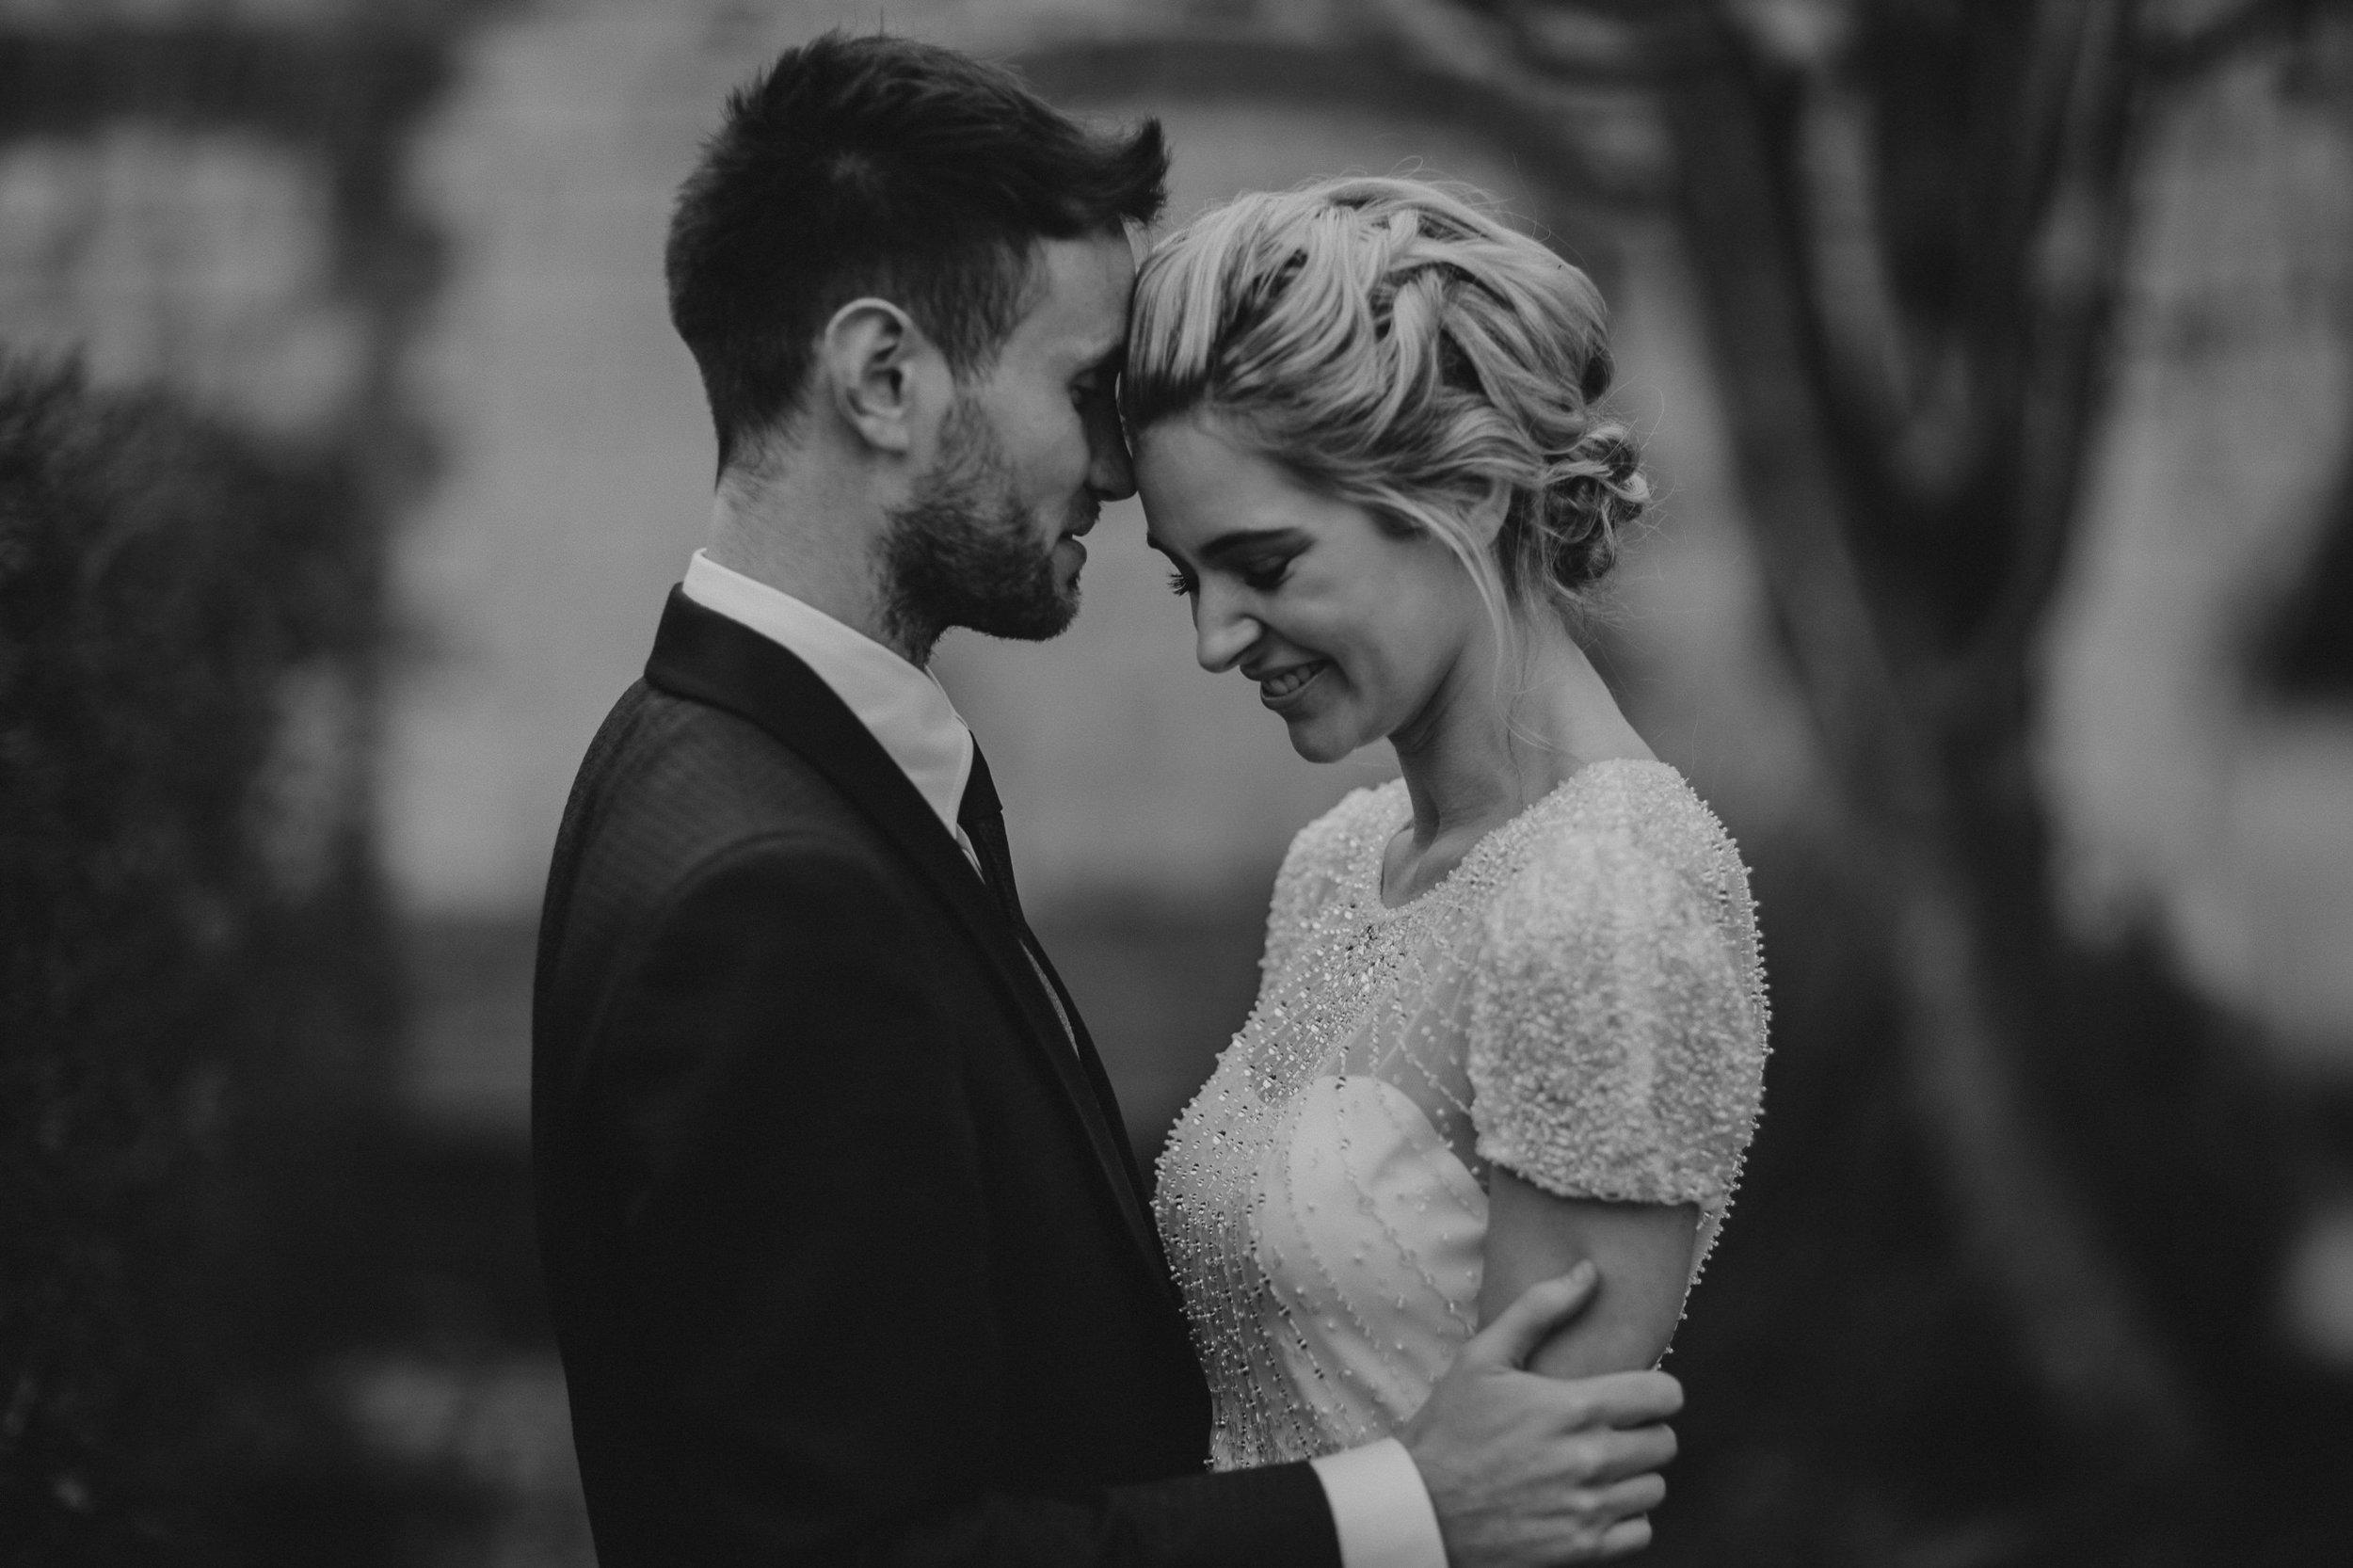 London_wedding_photographer_gione_da_silva_carelle_paul168.jpg